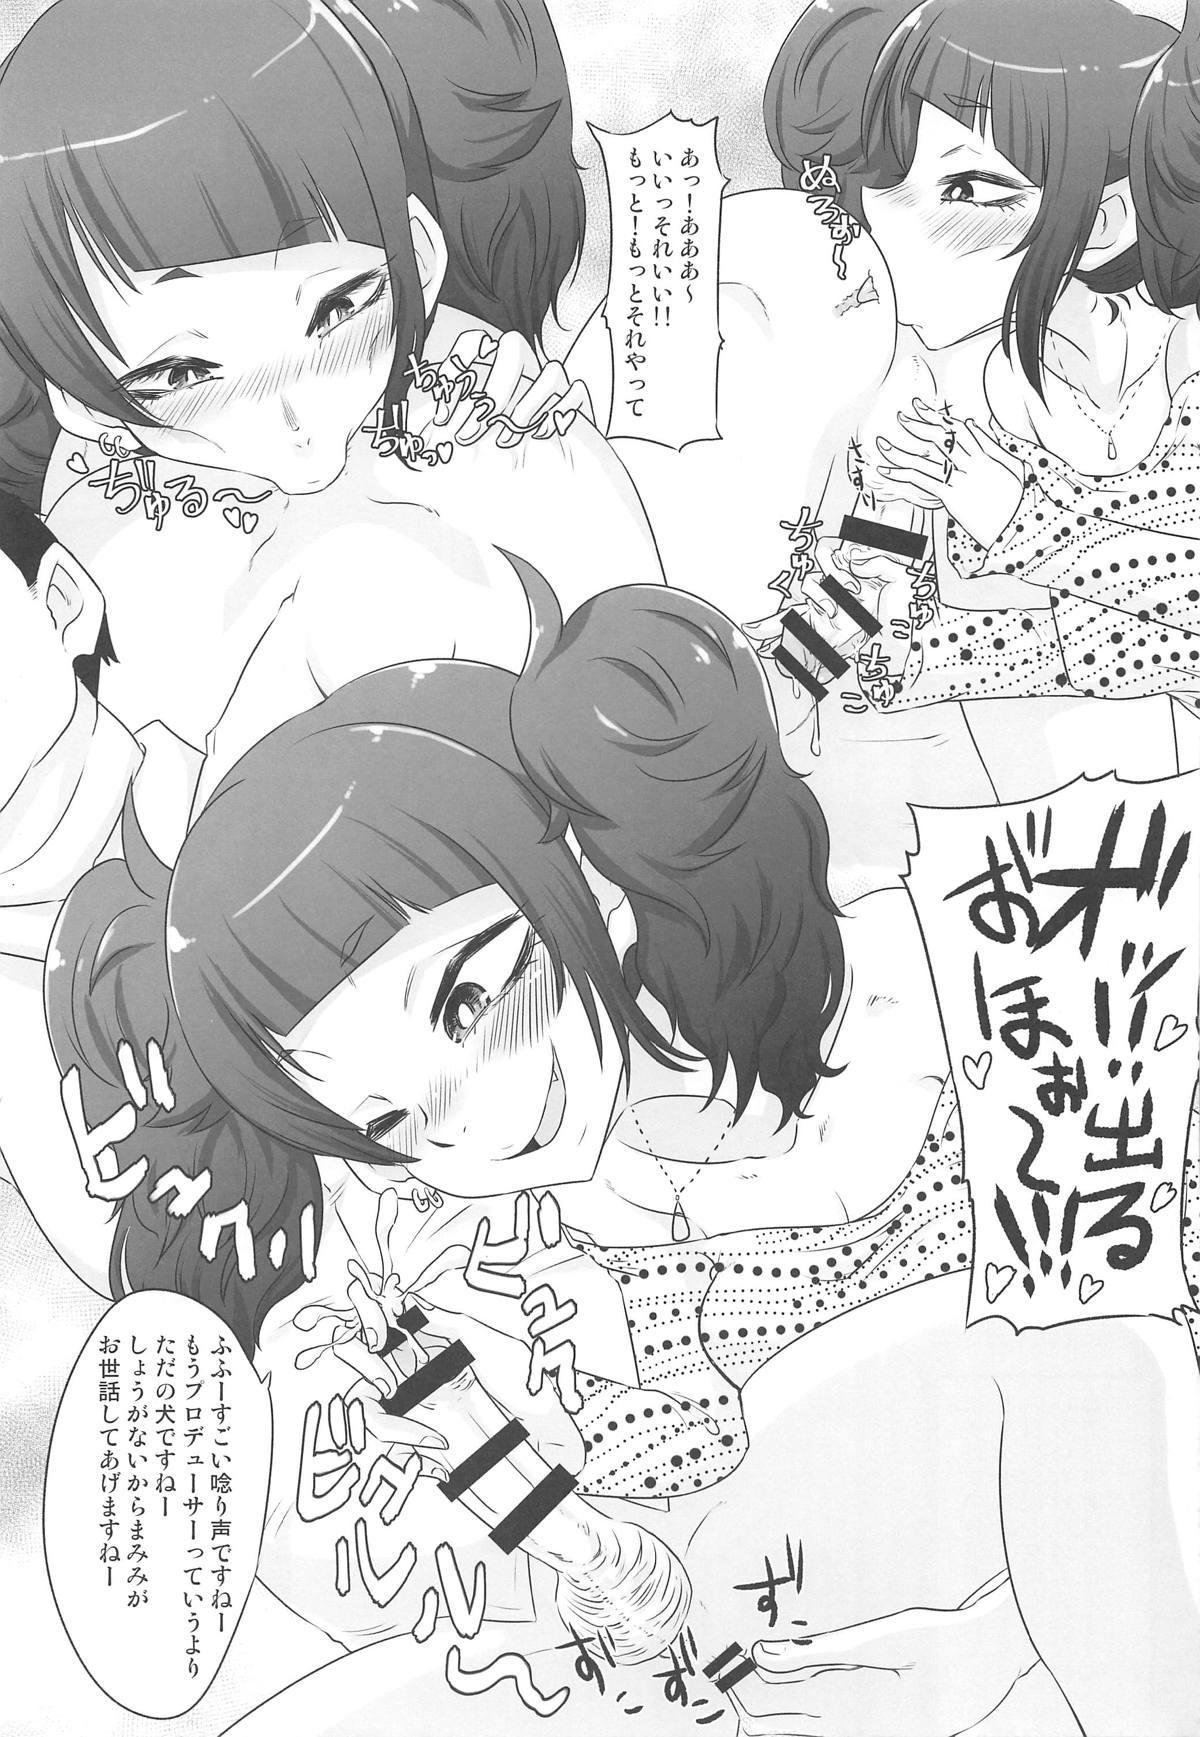 Mamimi no Itazura Nikki 11